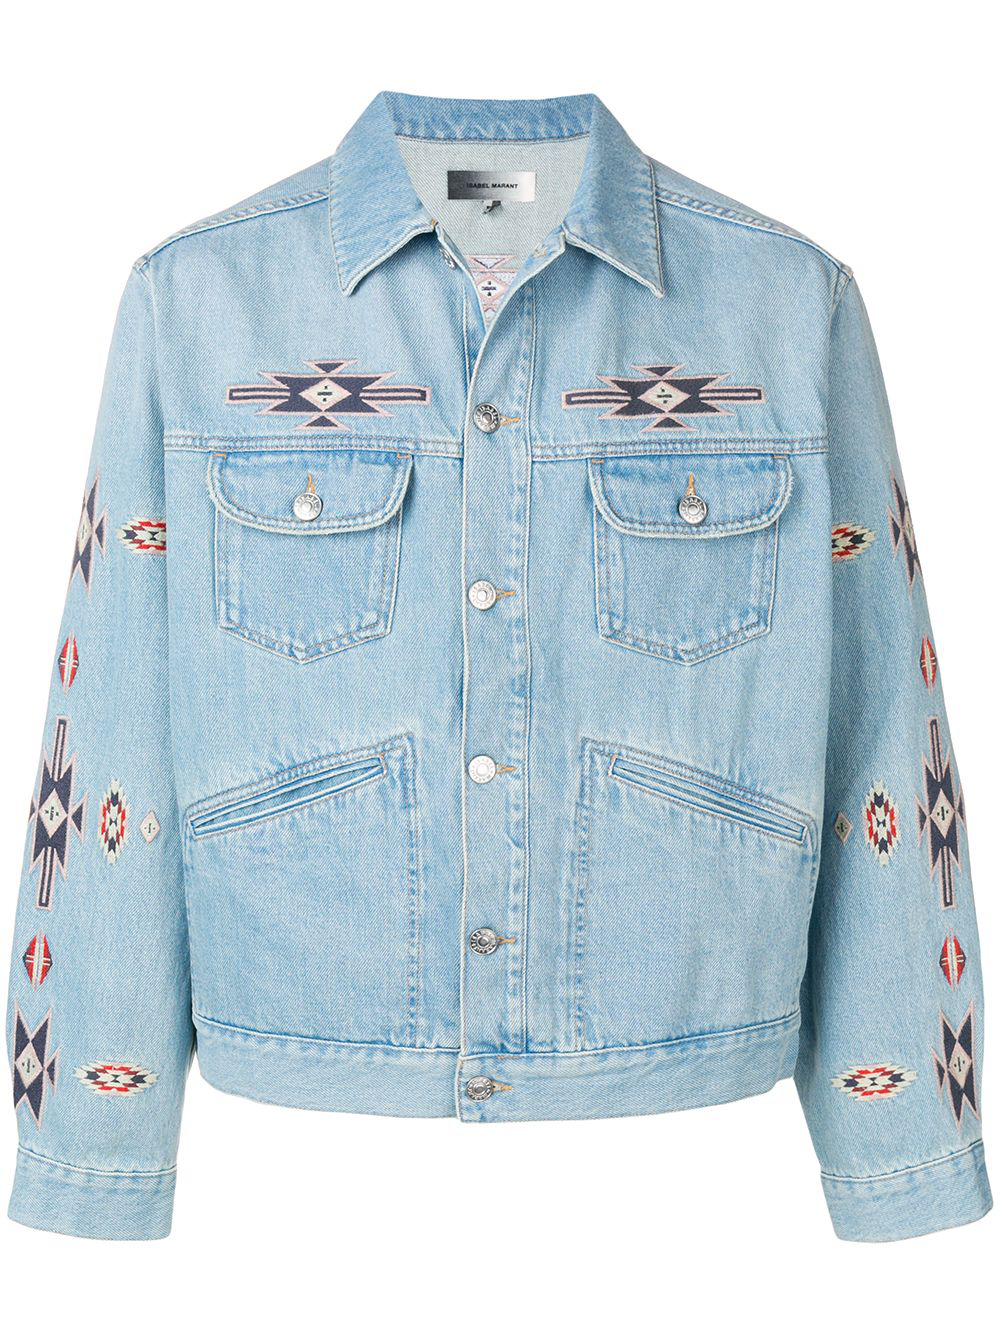 258b435a9fe46 Isabel Marant Jango Embroidered Denim Jacket - Light Denim In Blue ...